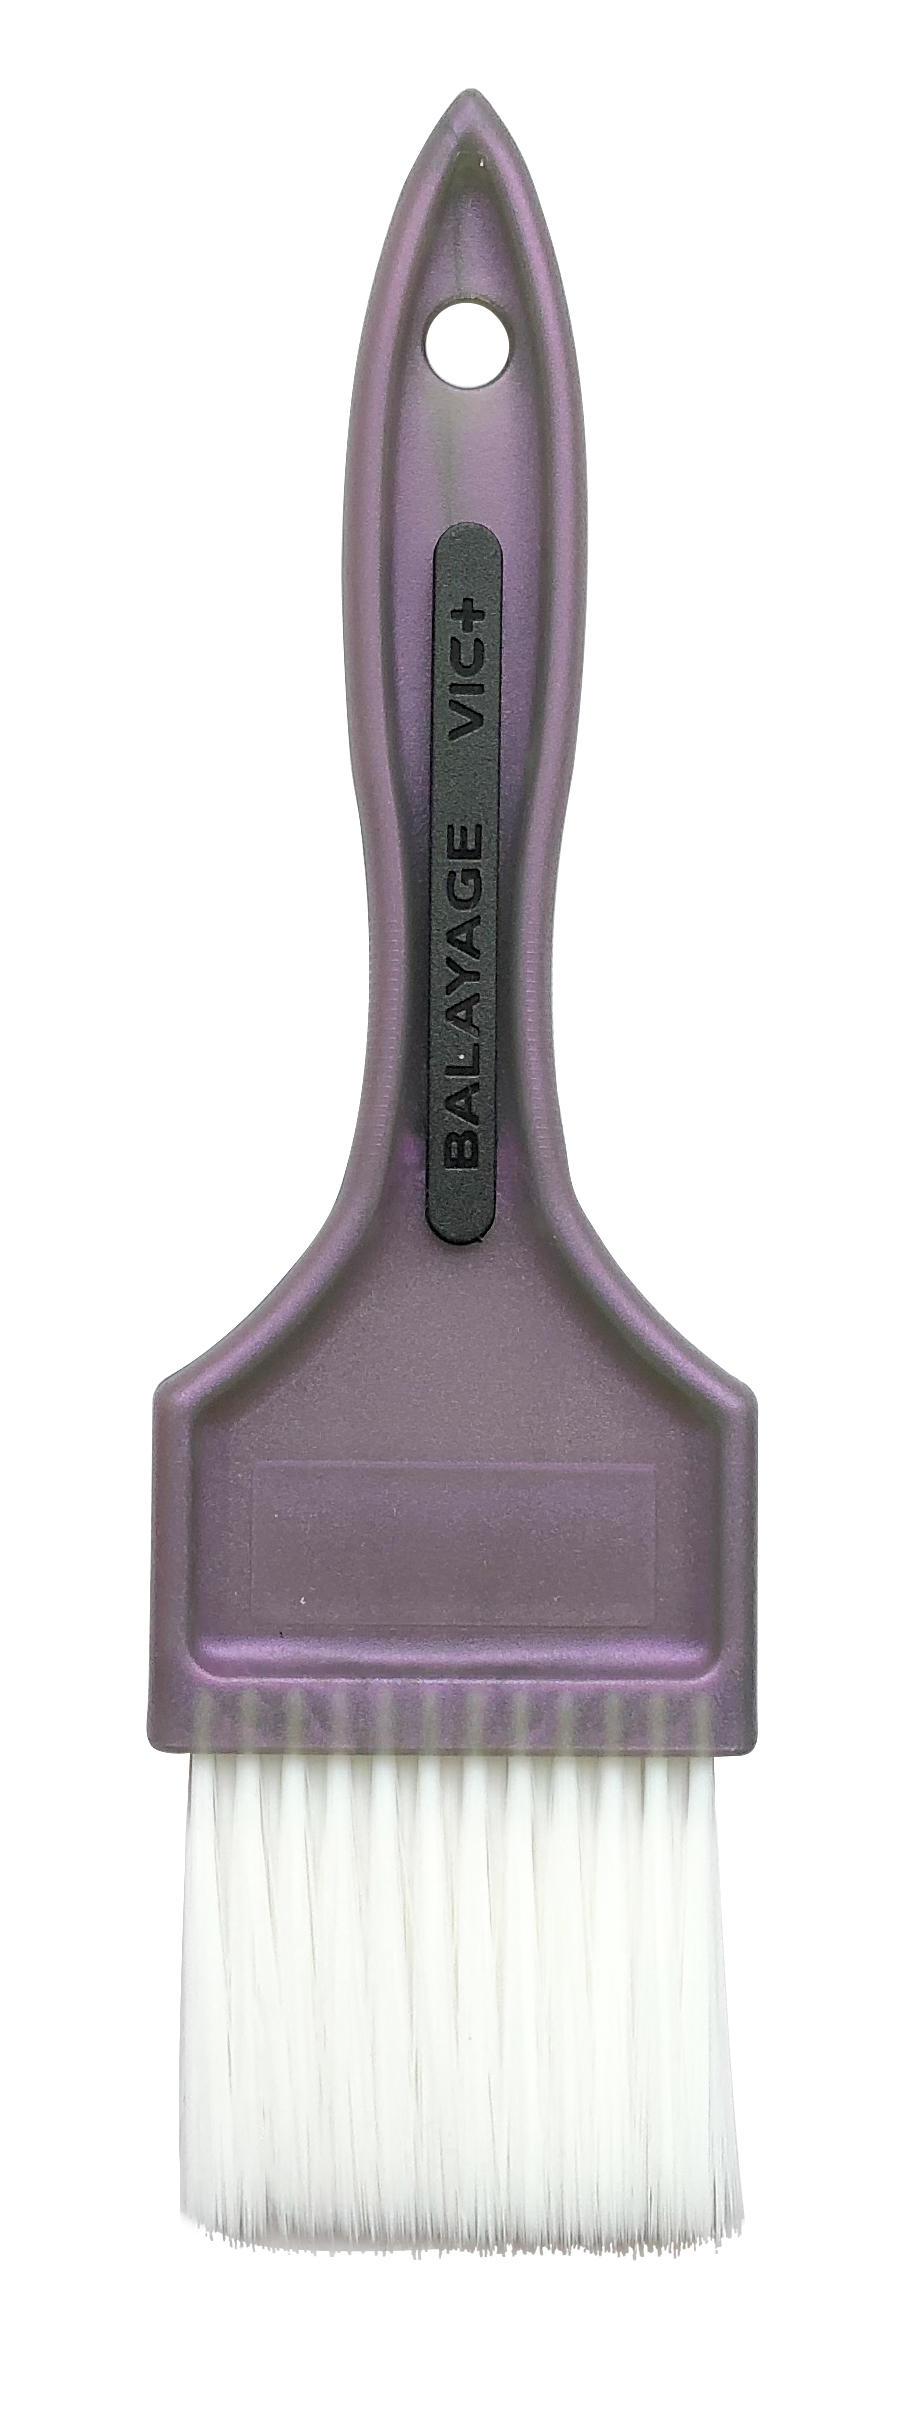 Salon Barber Hair Cut Styling Salon dye hair Color Hairdressing Tool Tinting Comb Brush